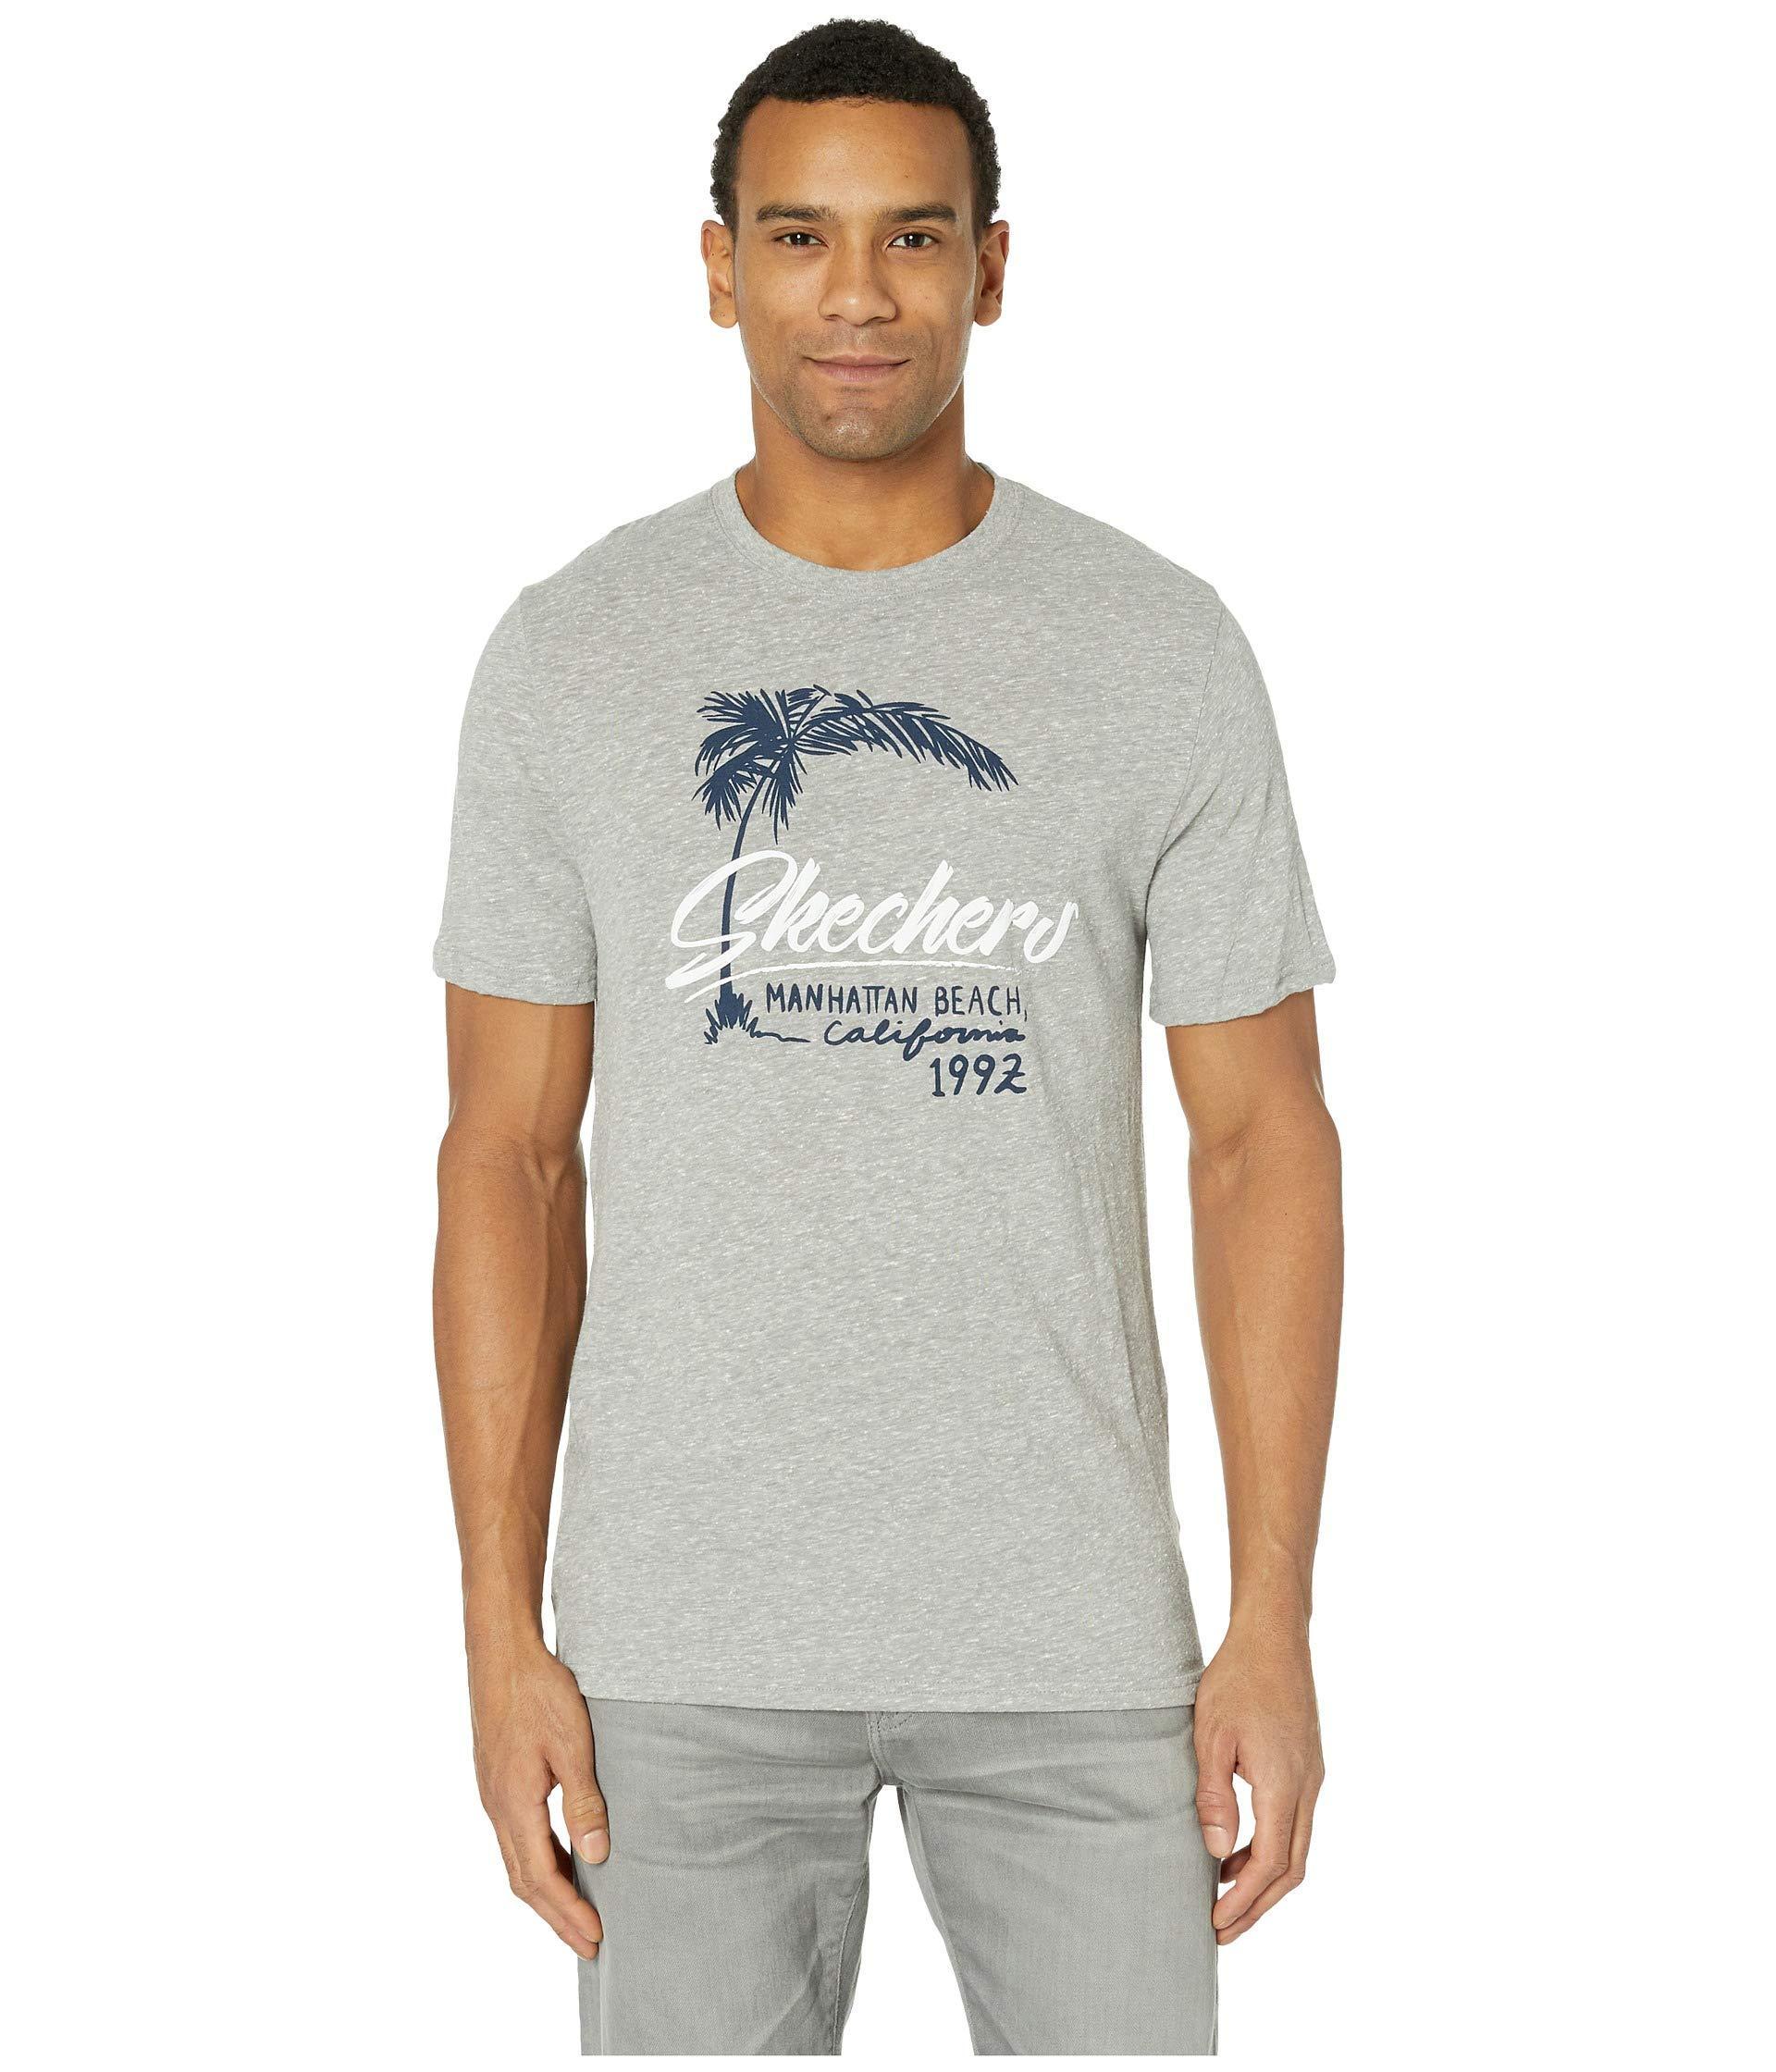 86a8f12459fa Lyst - Skechers Blissful Graphic Tee Manhattan Beach (gray) Men s T ...